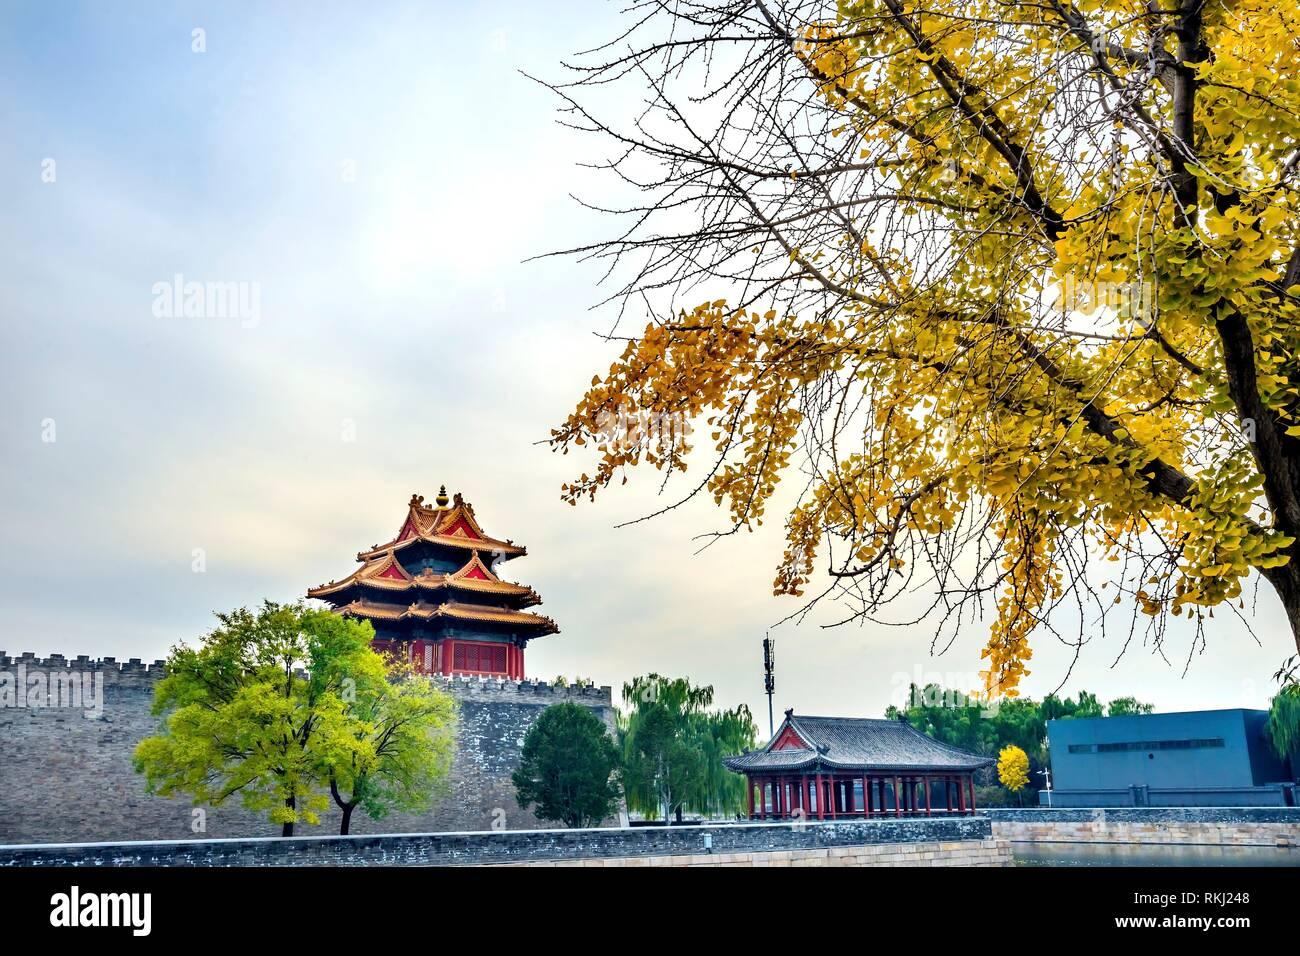 Pfeil Watch Tower Yellow Autumn Gugong Verbotene Stadt Graben Canal Plaace Wand Beijing China. Der Kaiserpalast in den 1600er Jahren in der Ming-dynastie gebaut Stockbild